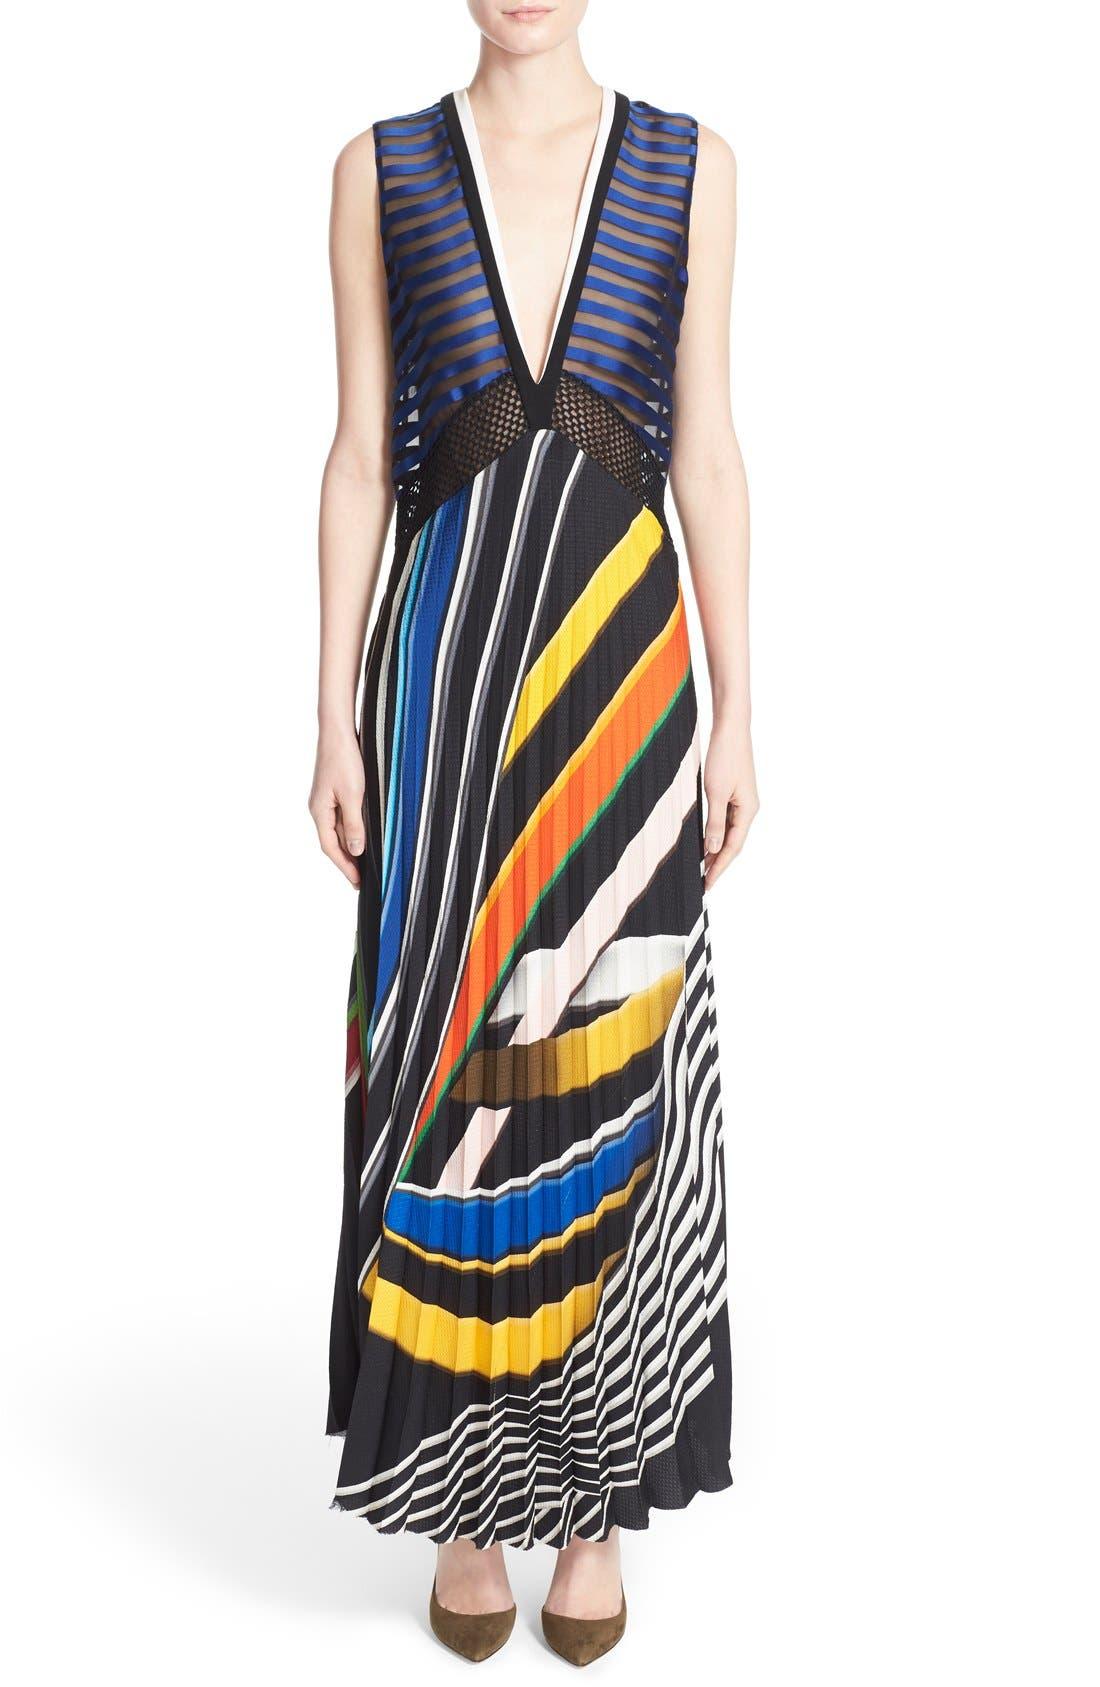 Alternate Image 1 Selected - Mary Katrantzou 'Rindi' V Neck Satin Dress